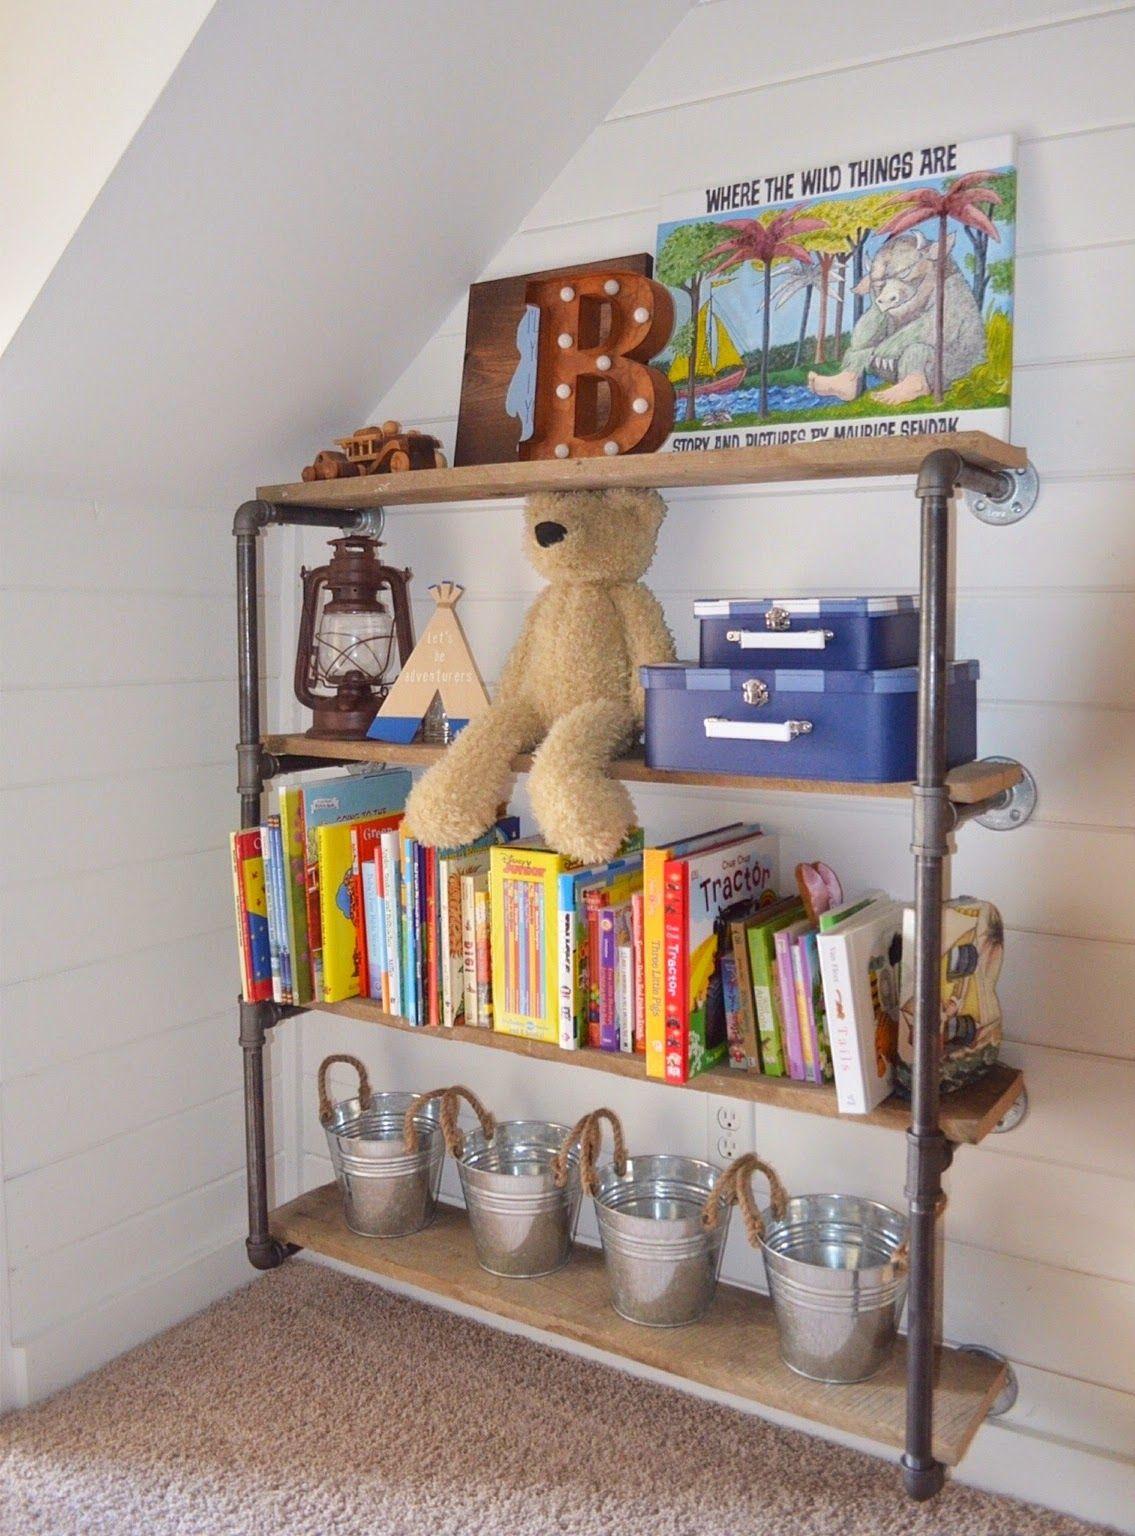 Diy Rustic Bookshelf In Our Latest Nursery Reveal